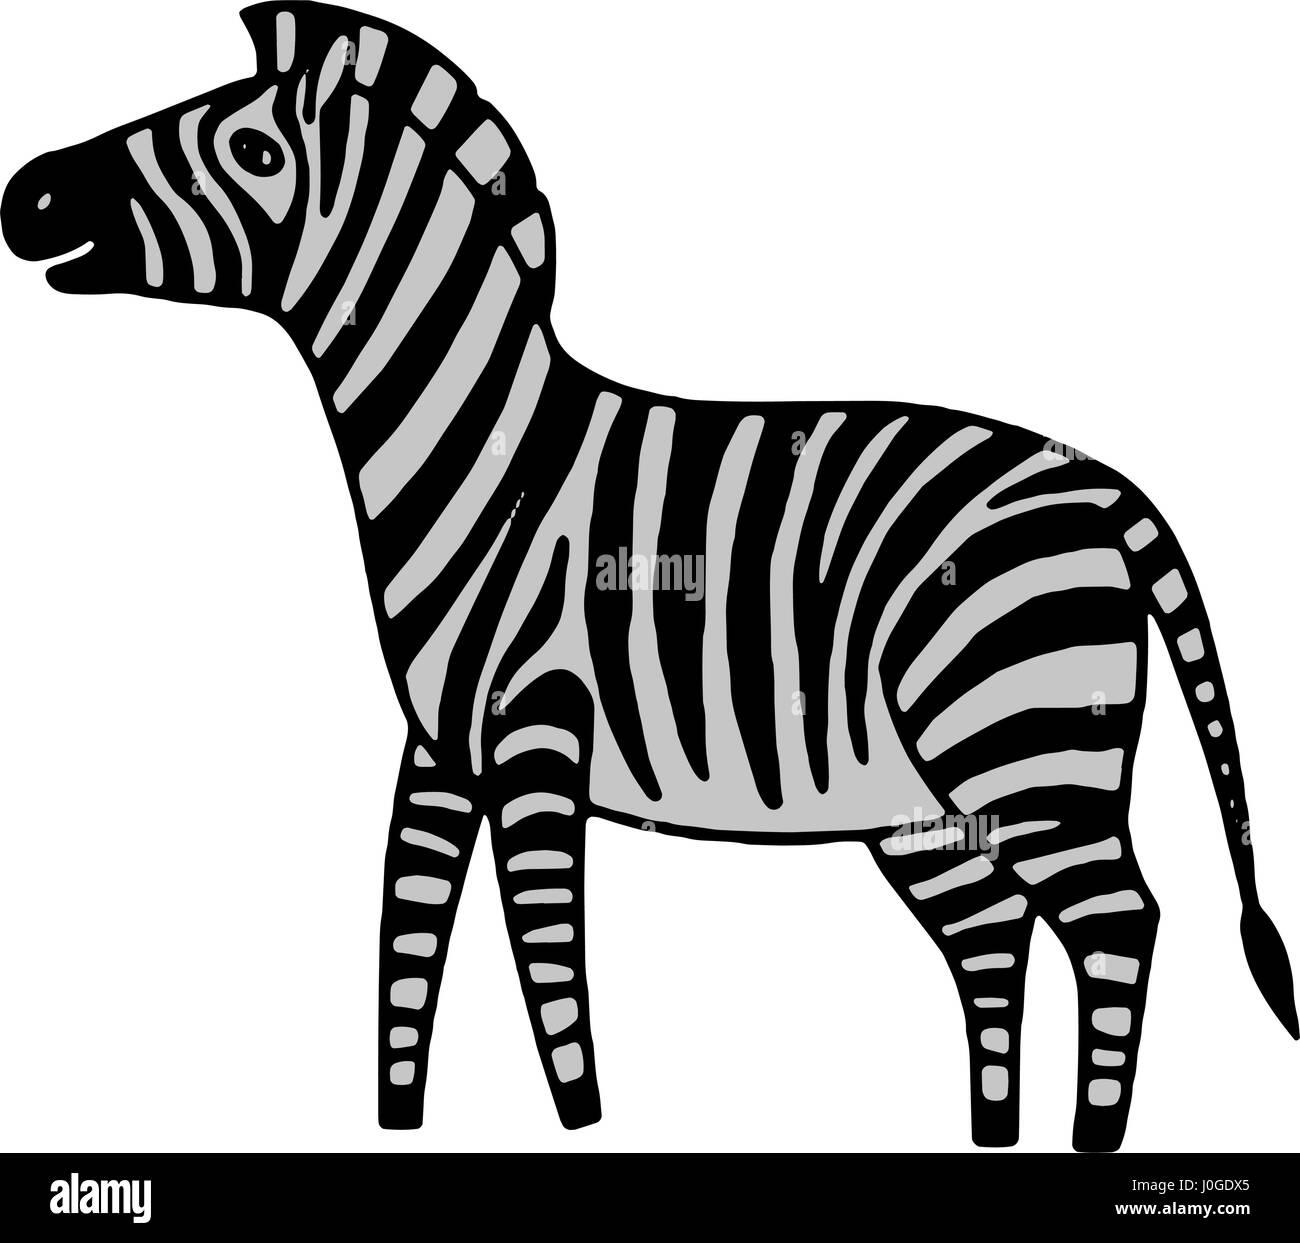 black and white zebra vector illustration stock vector art rh alamy com zebra victor vasarely zebra vector free download